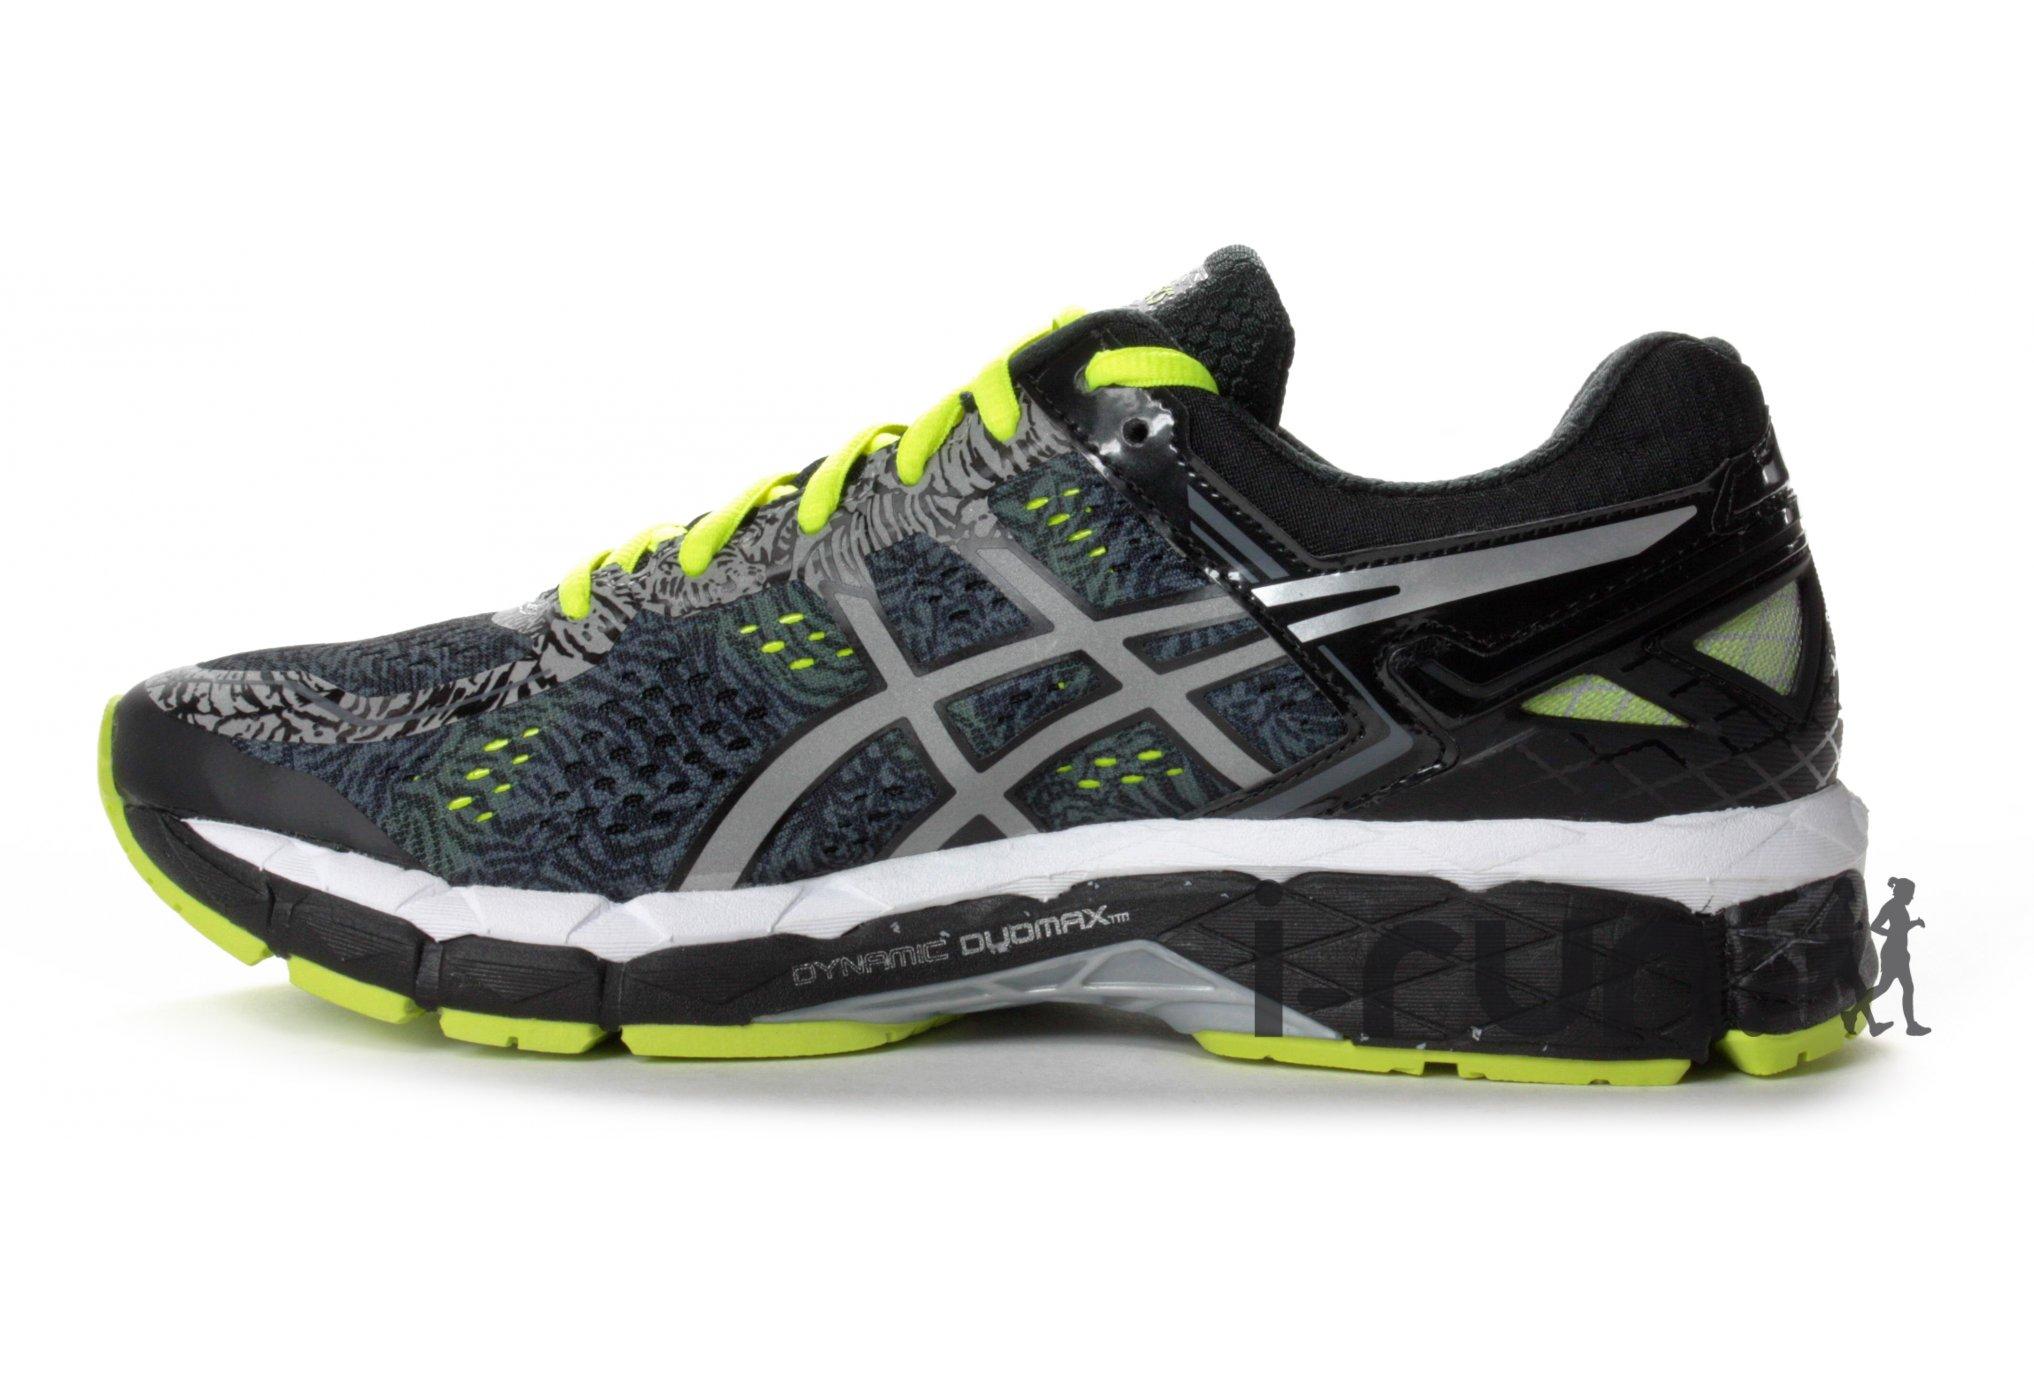 Gel zone 5 Asics Chaussures De Running 08XwOPkn